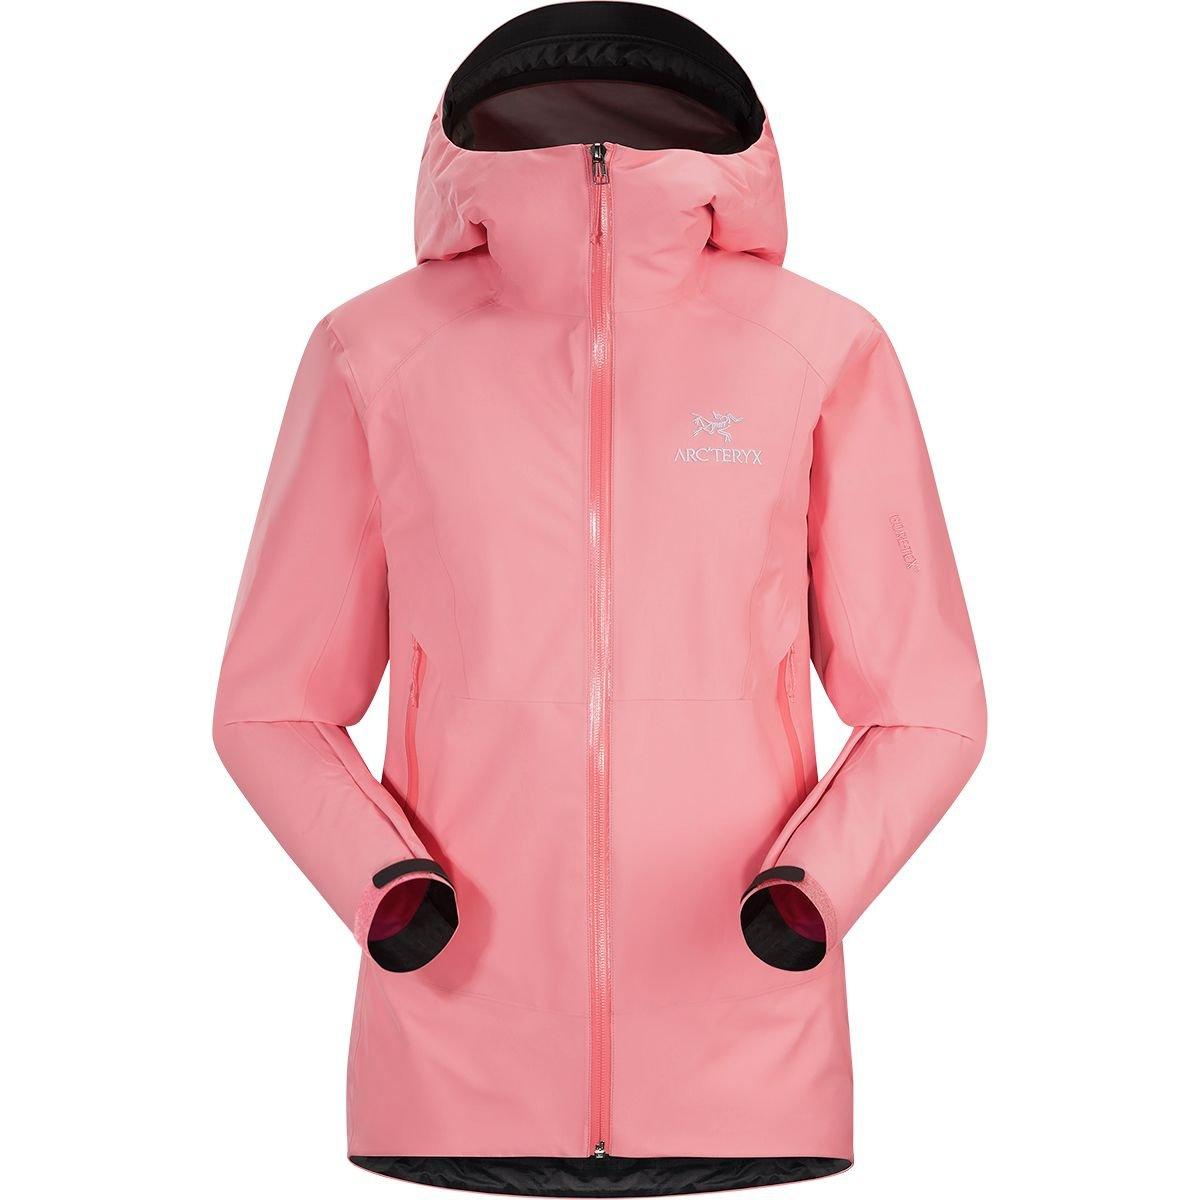 Arc'teryx Beta SL Jacket - Women's Lamium Pink Large